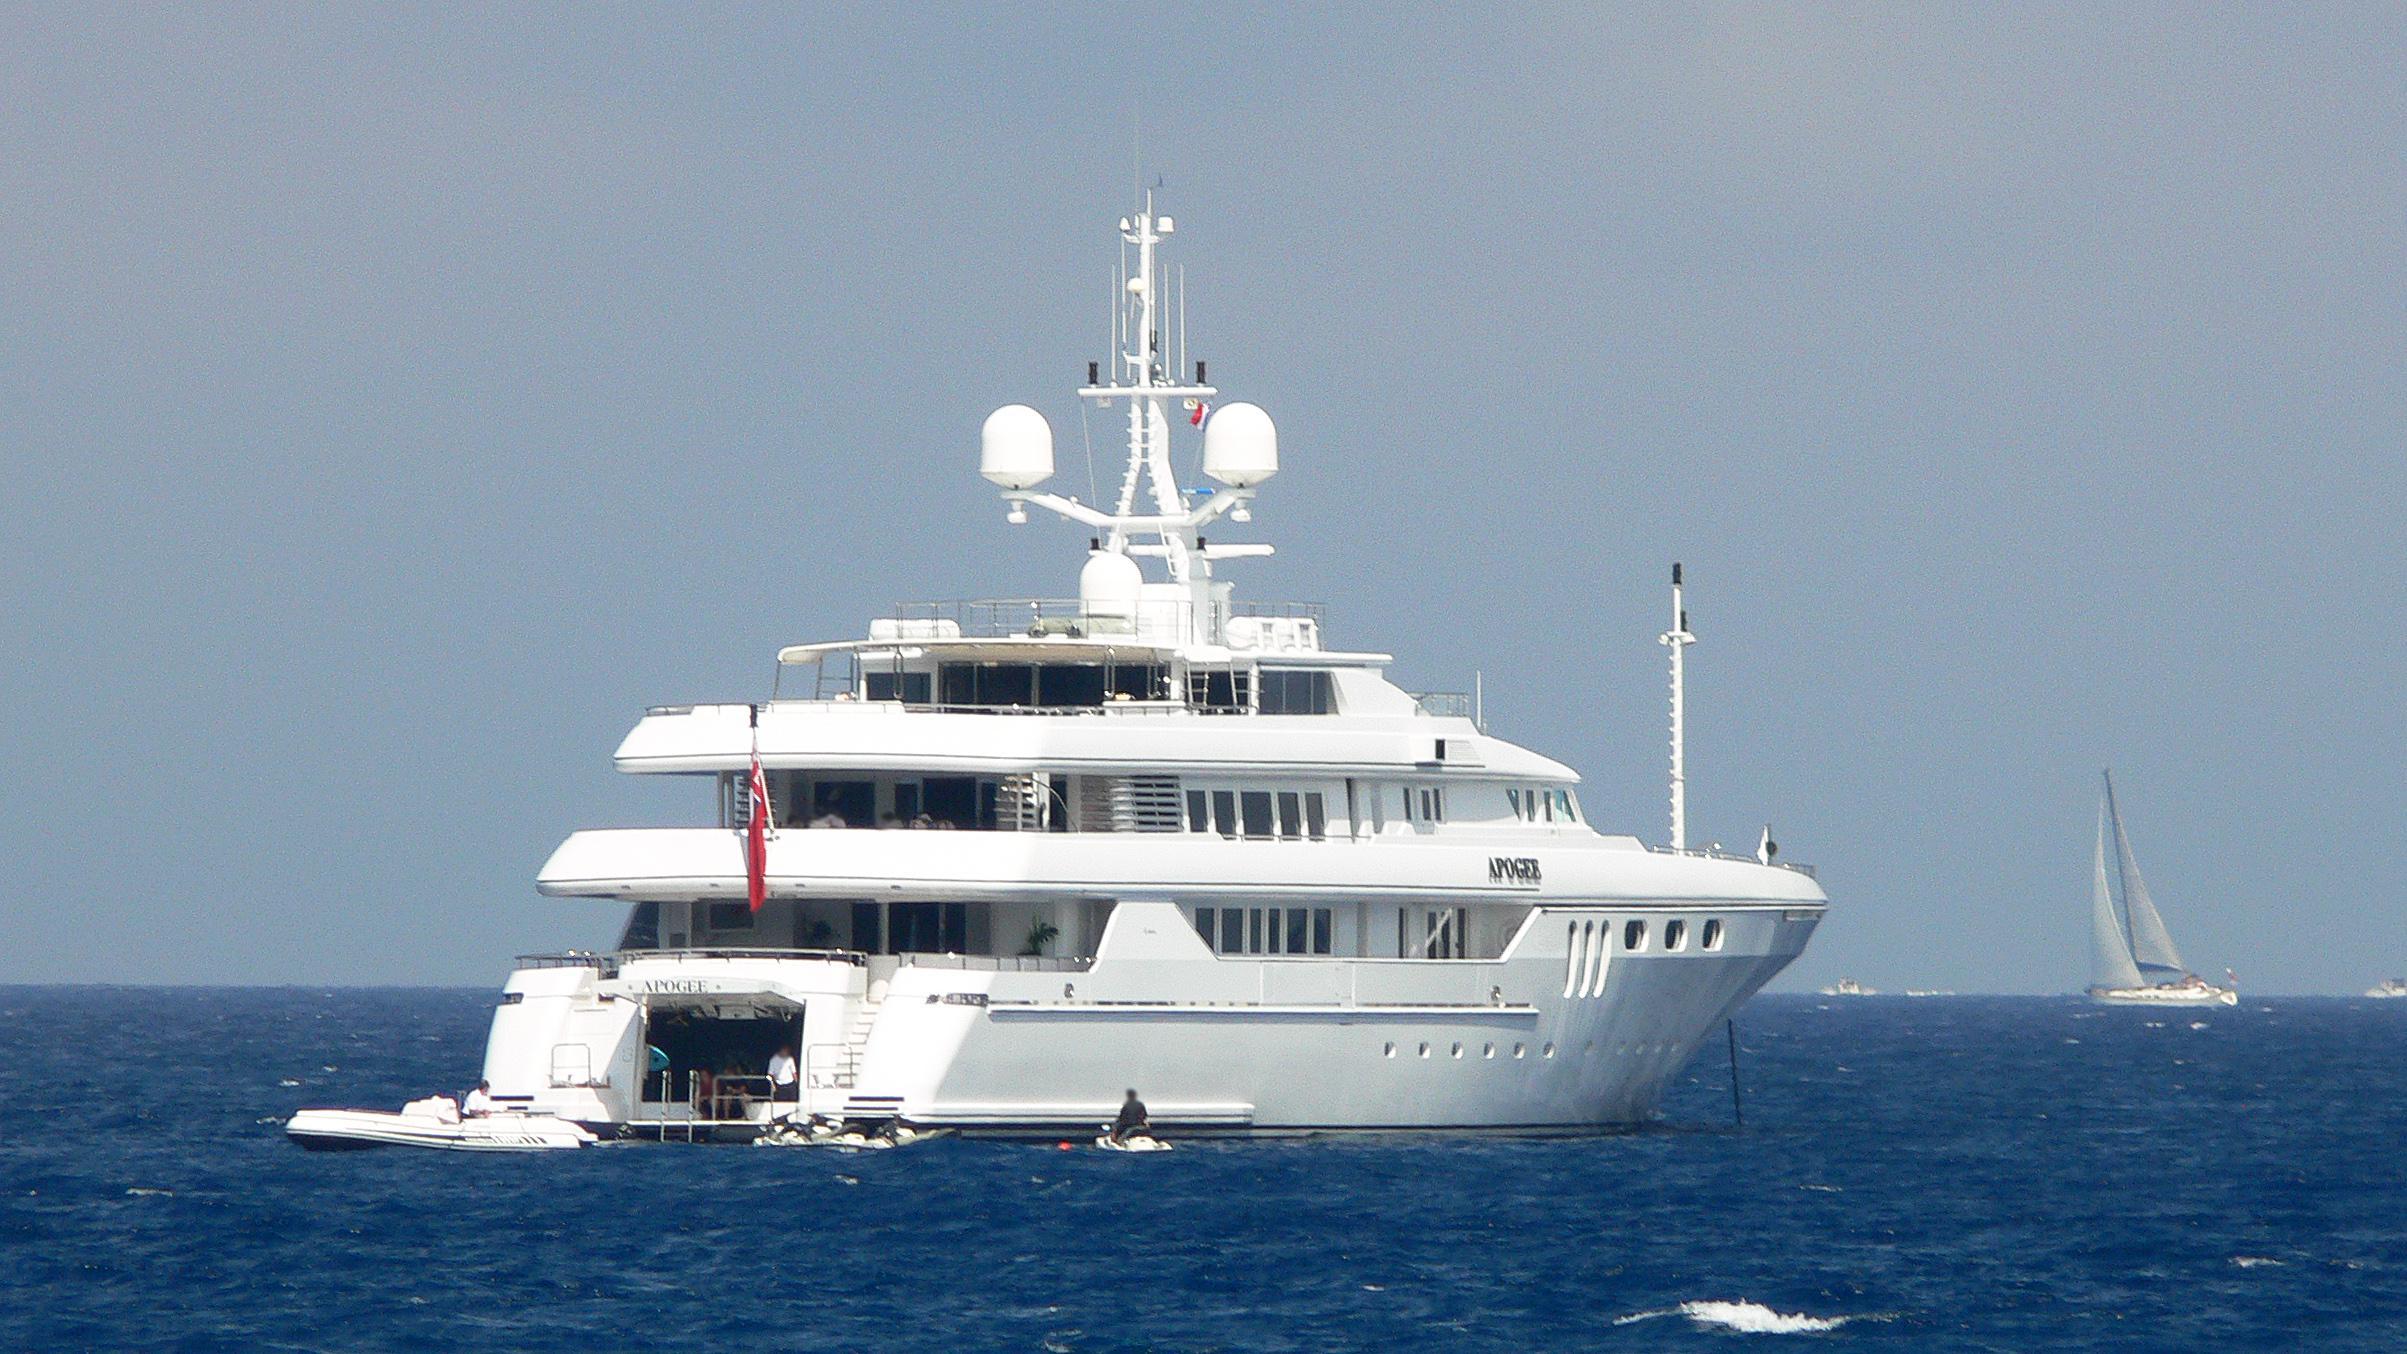 apogee-motor-yacht-codecasa-2003-62m-stern